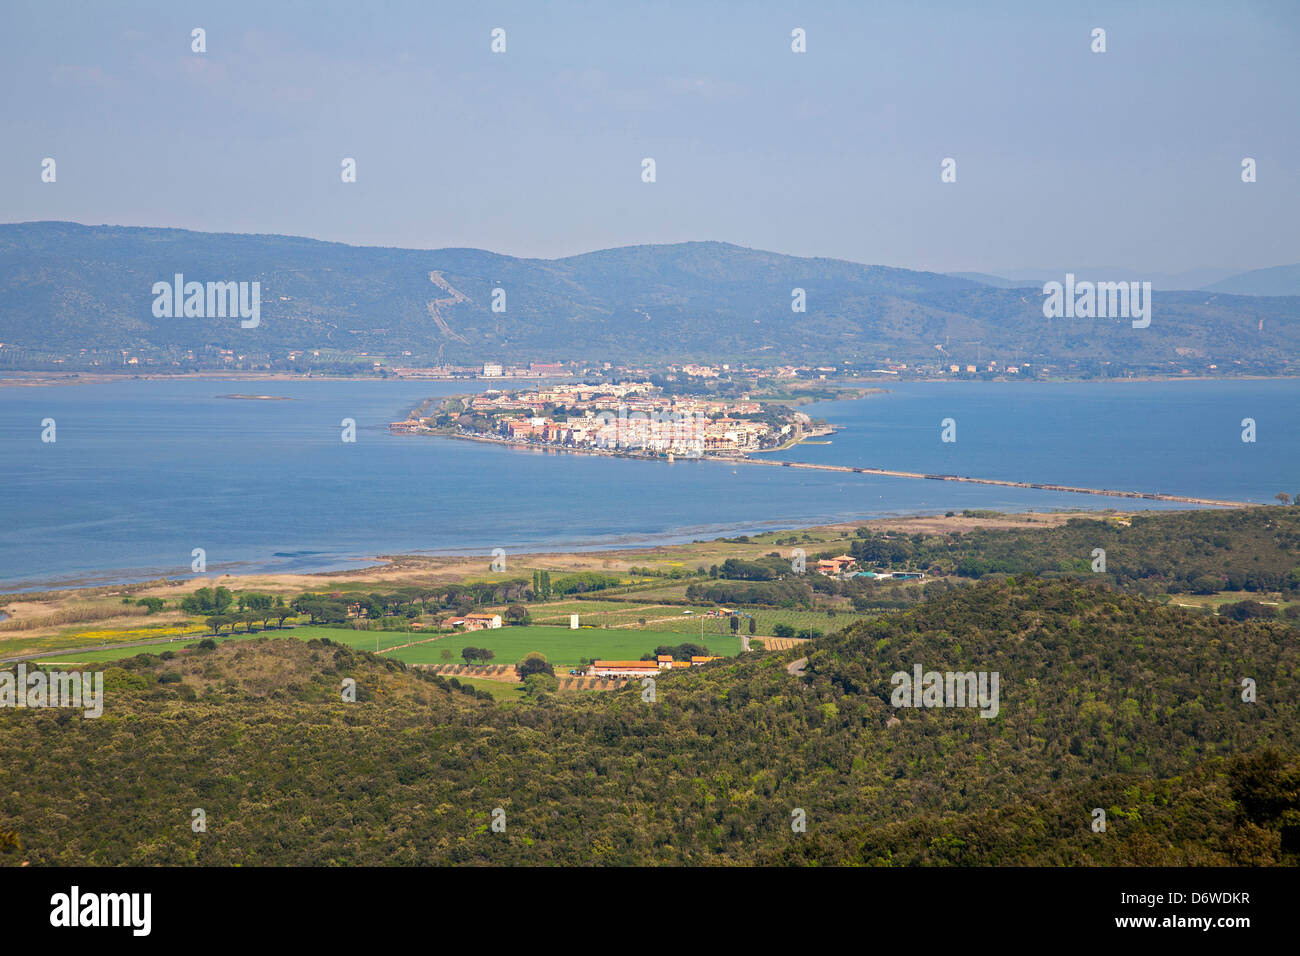 europe, italy, tuscany, maremma, argentario, view of the lagoon of orbetello - Stock Image